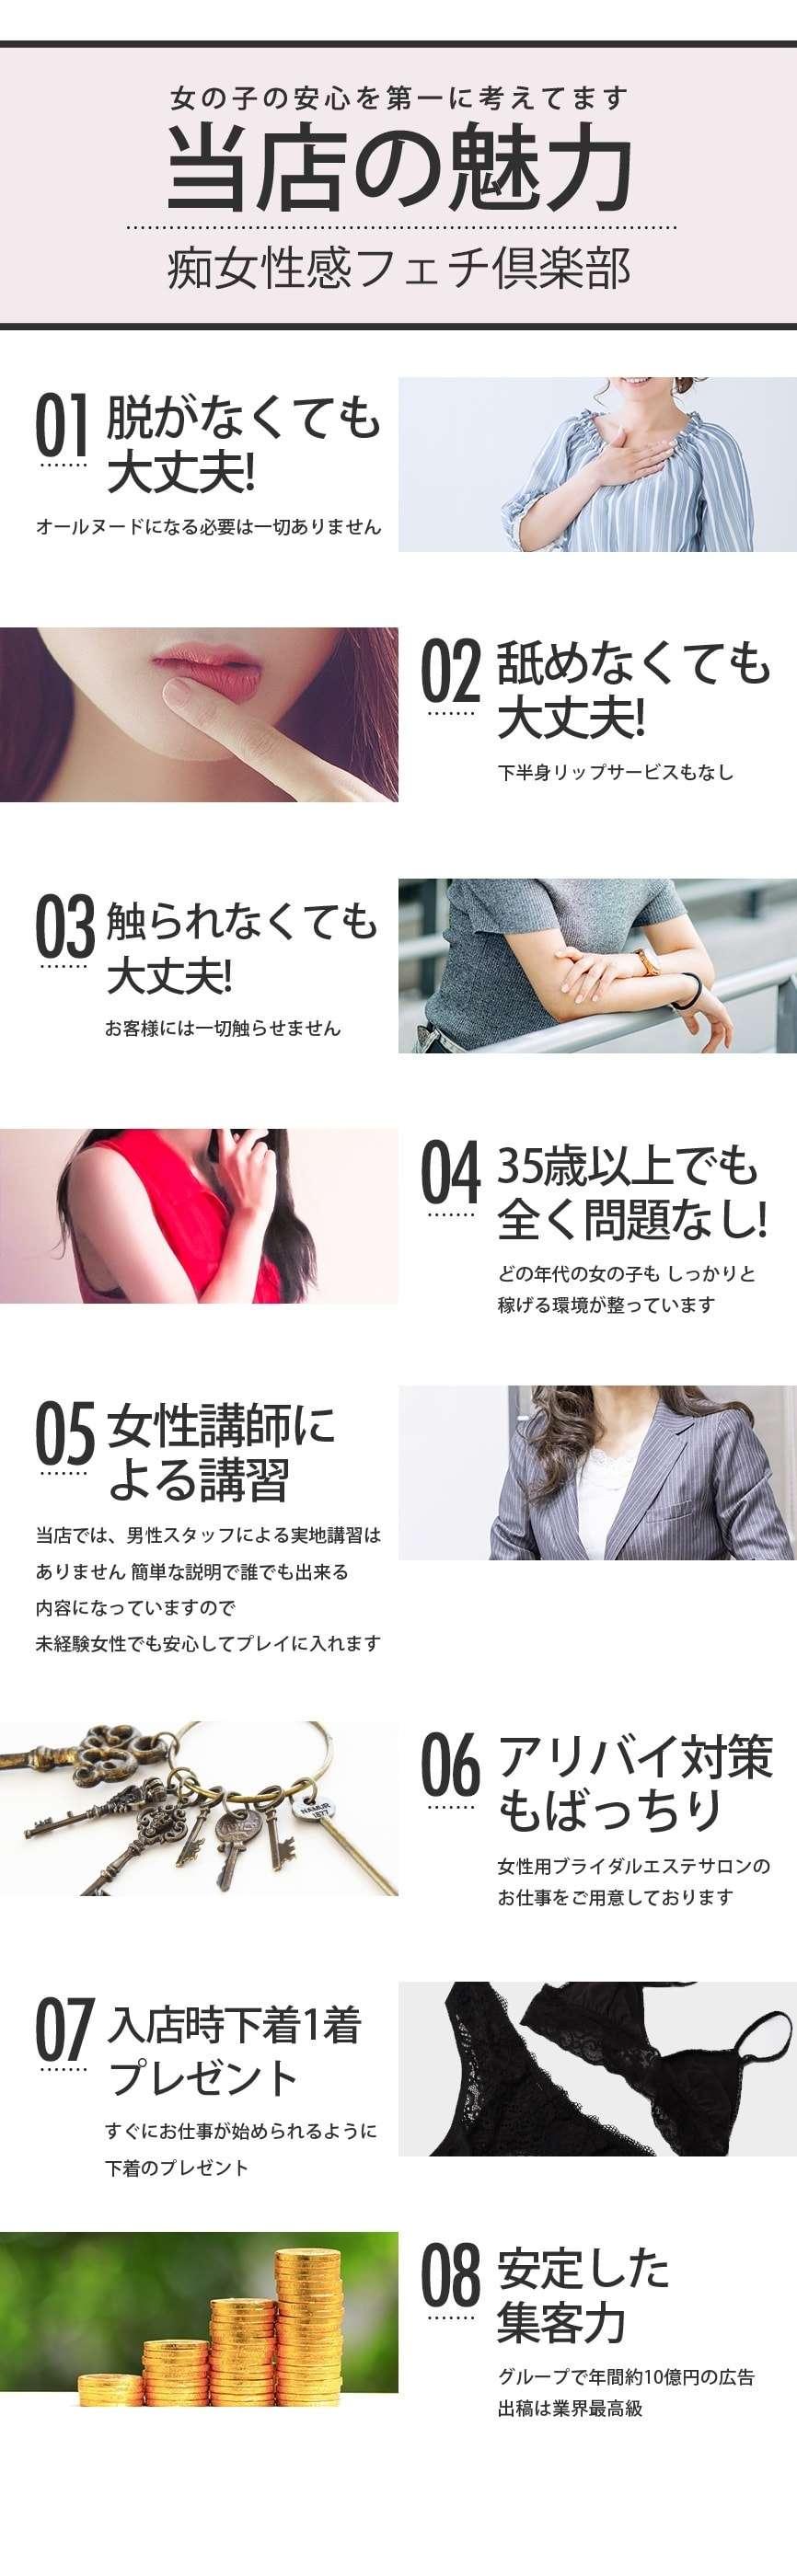 job_free1.jpg?cache01=20150911183251&img